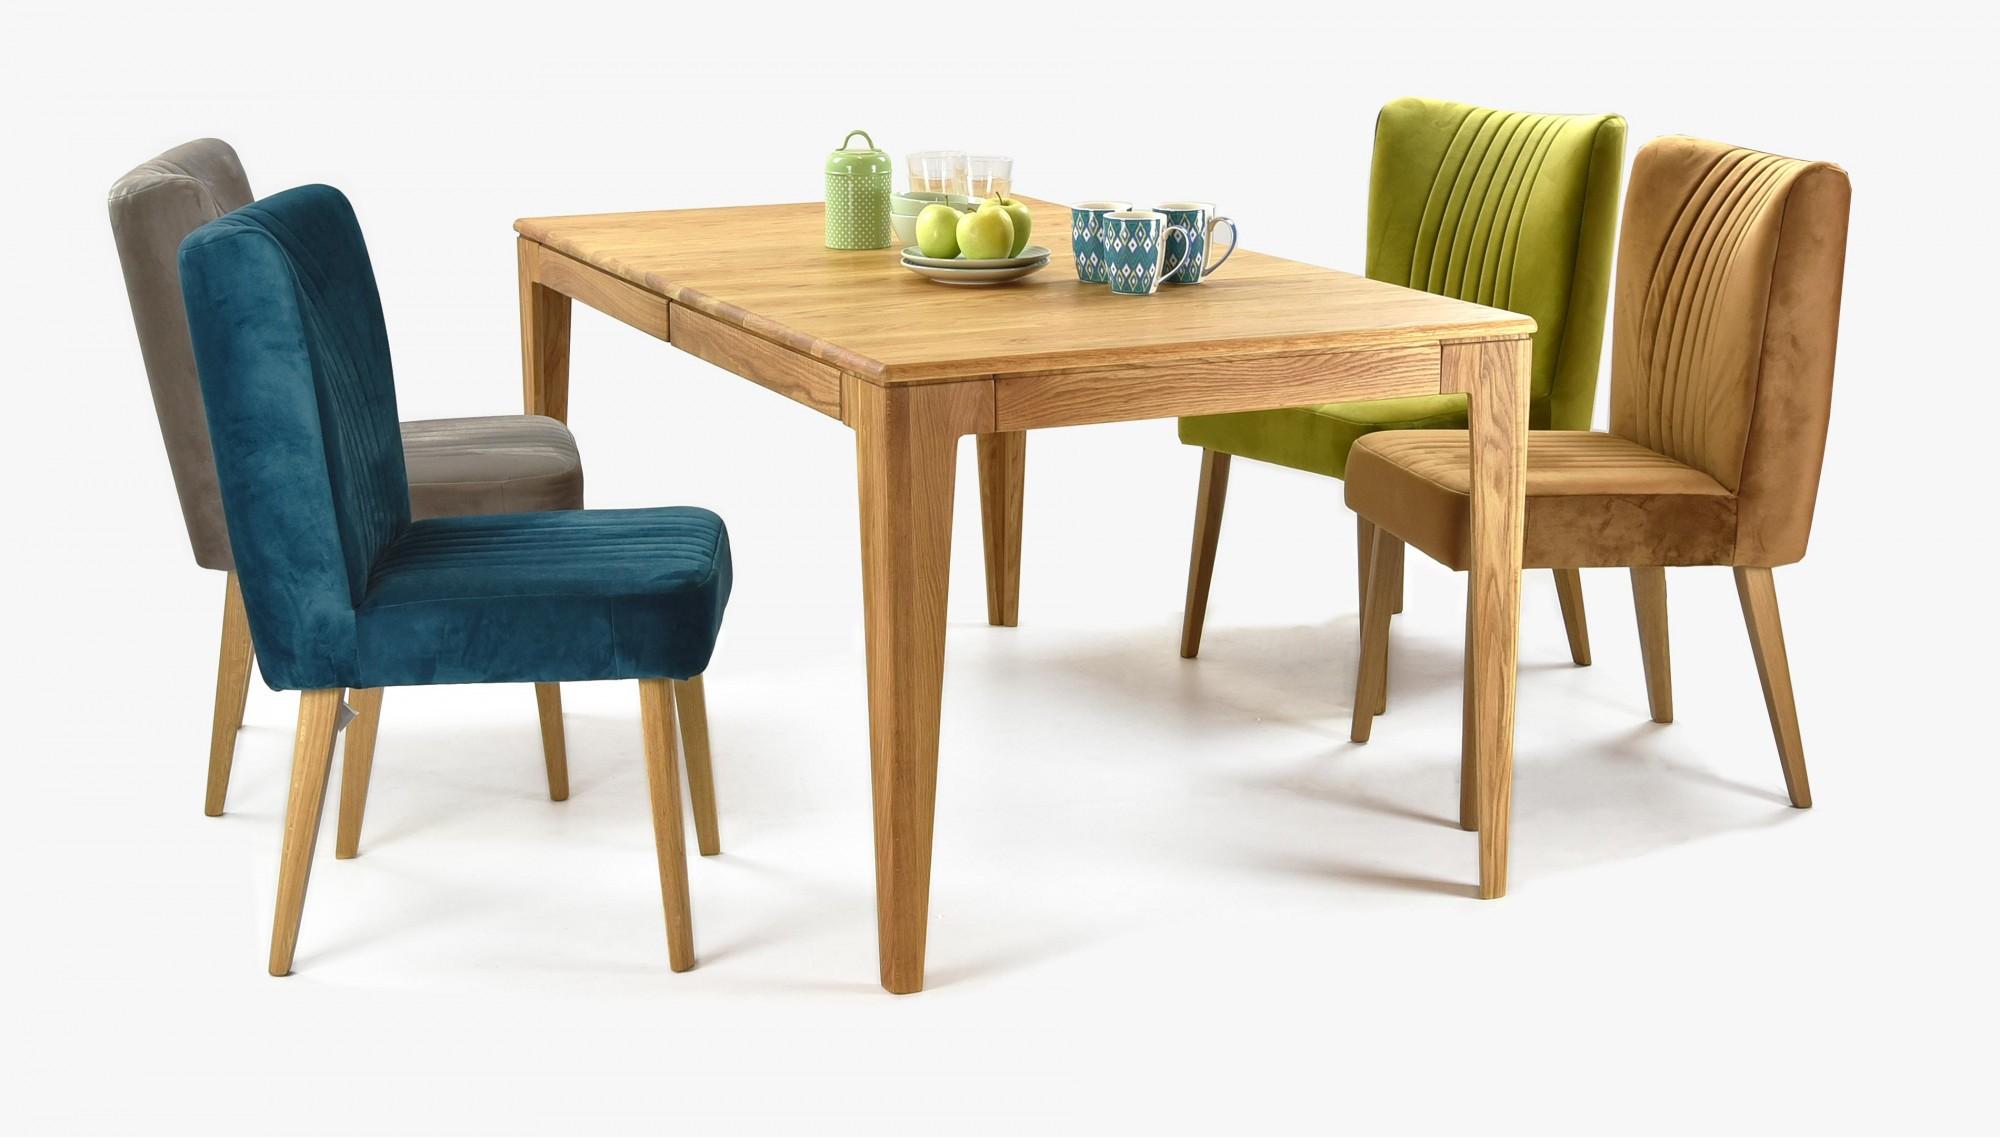 Jedalenský set stôl a stoličky do jedálne